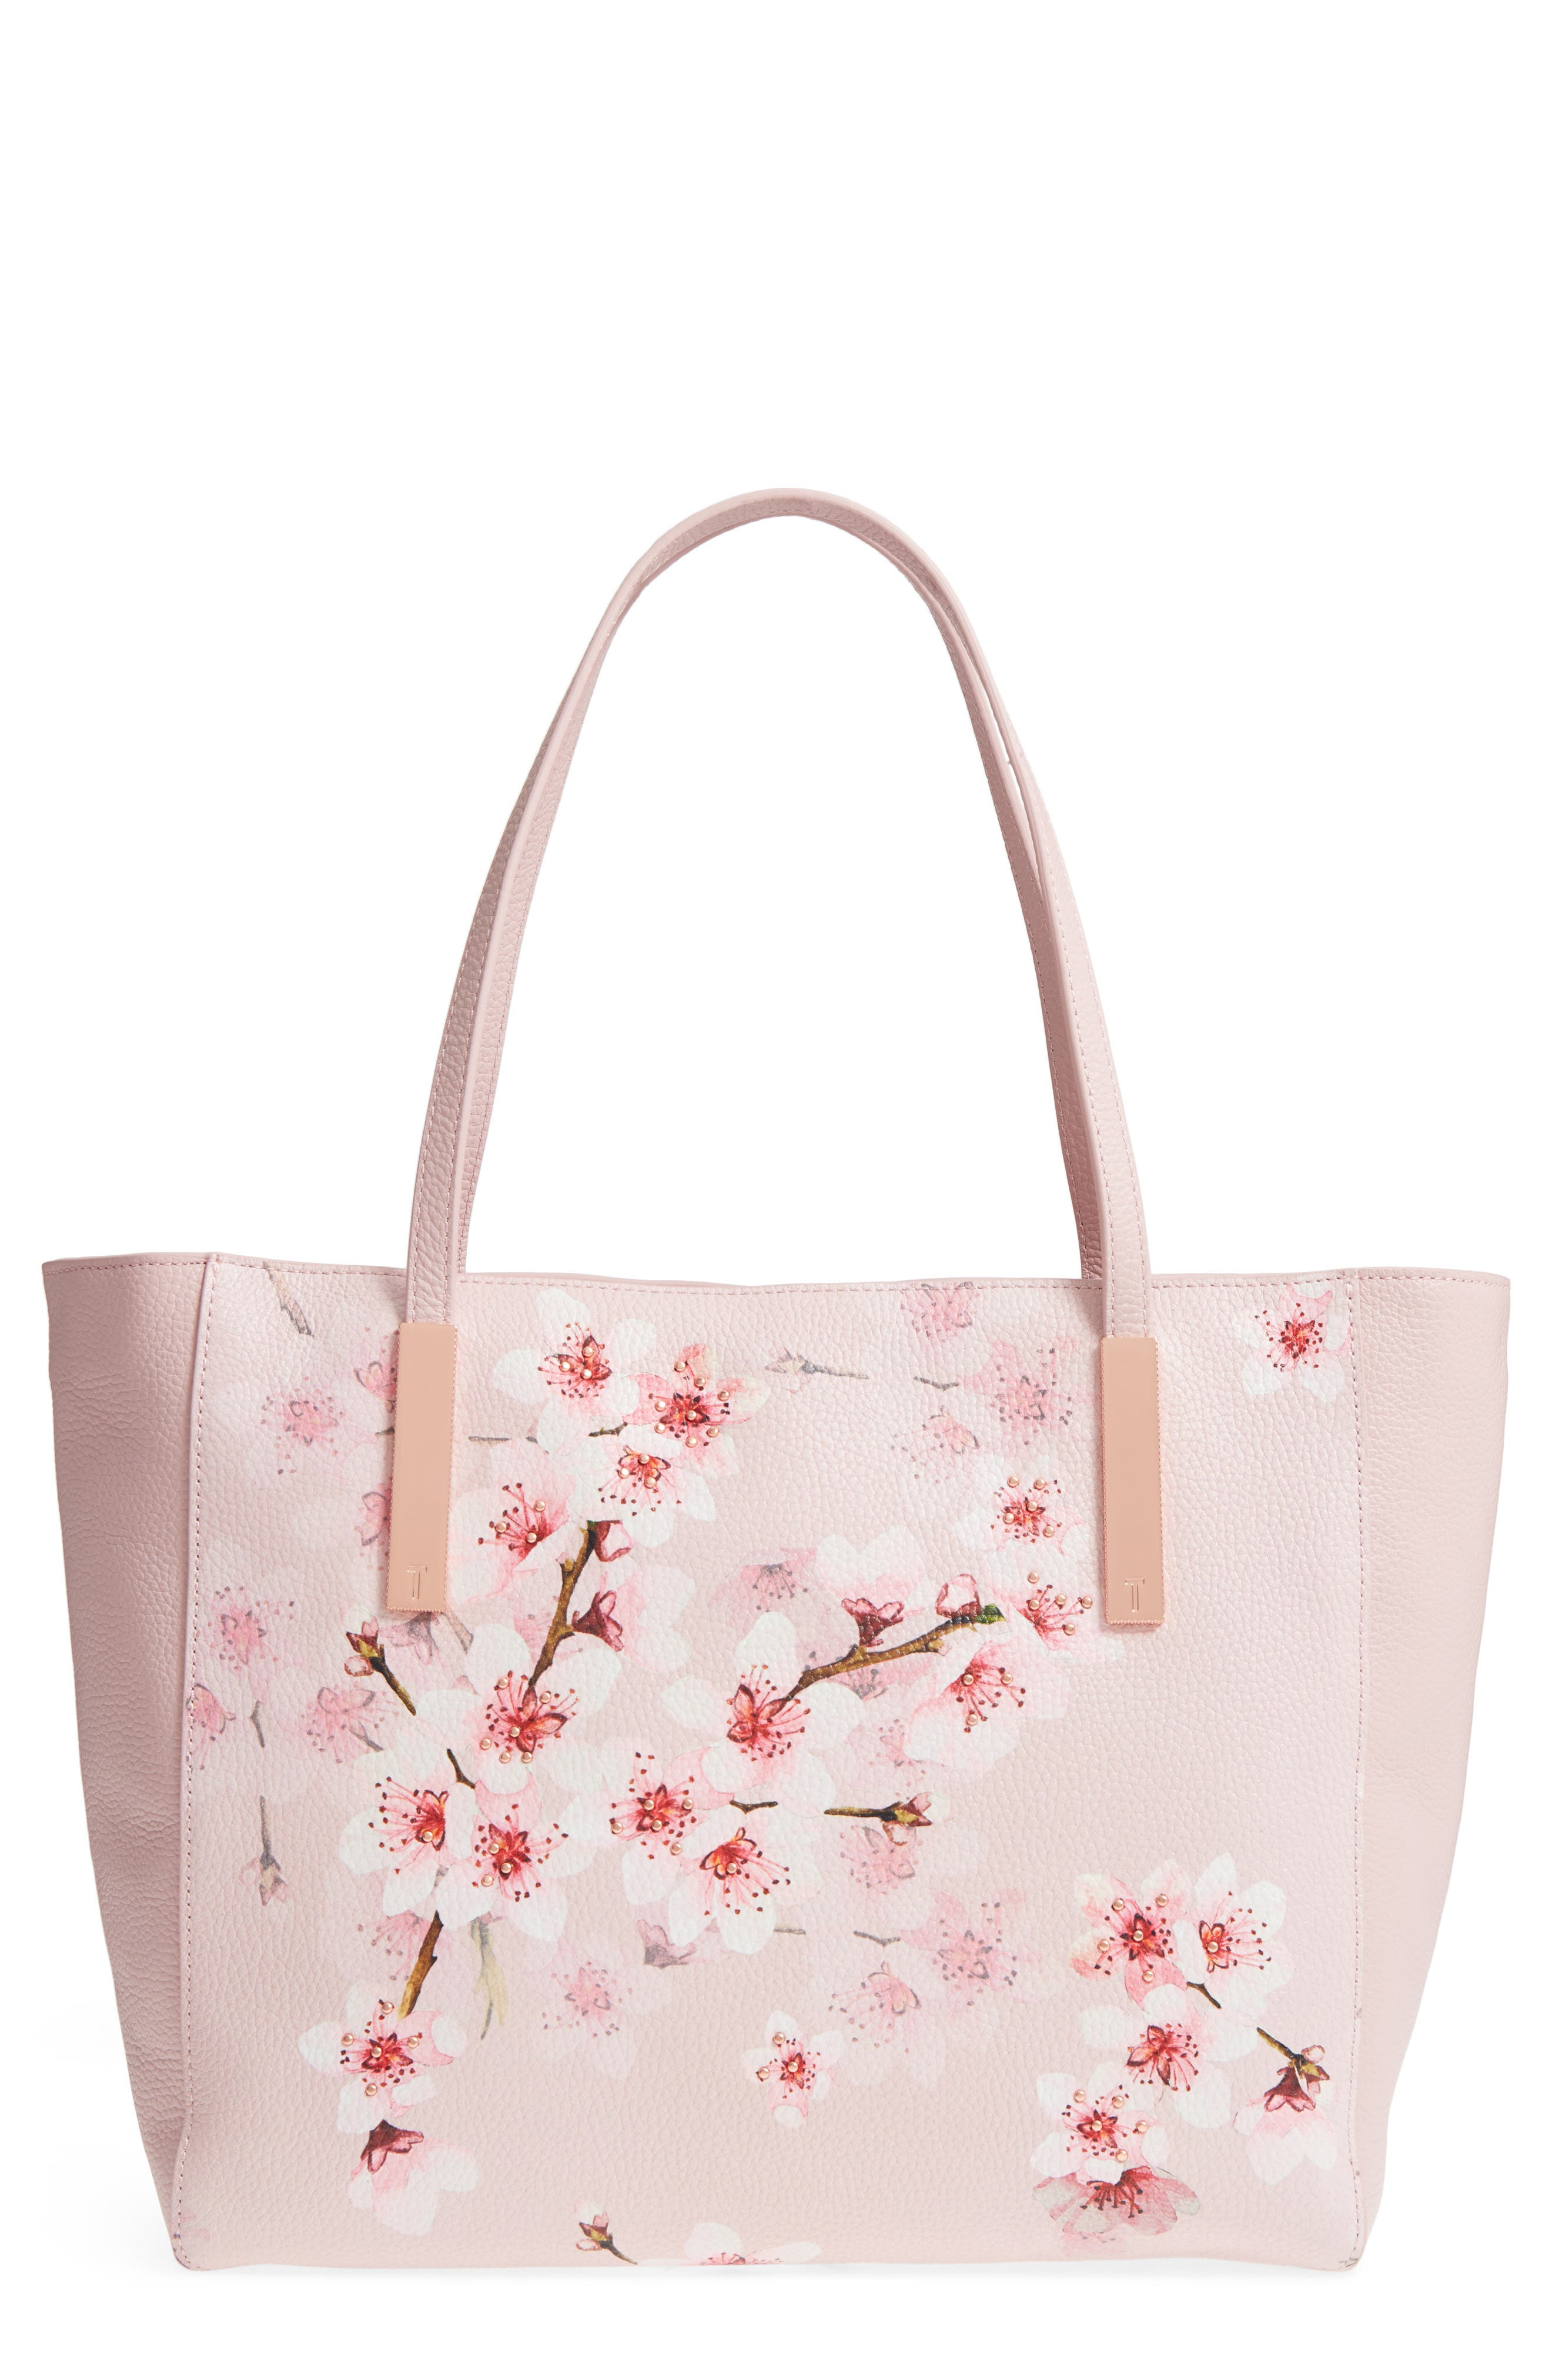 Soft Blossom Leather Shopper,                             Main thumbnail 1, color,                             Light Pink